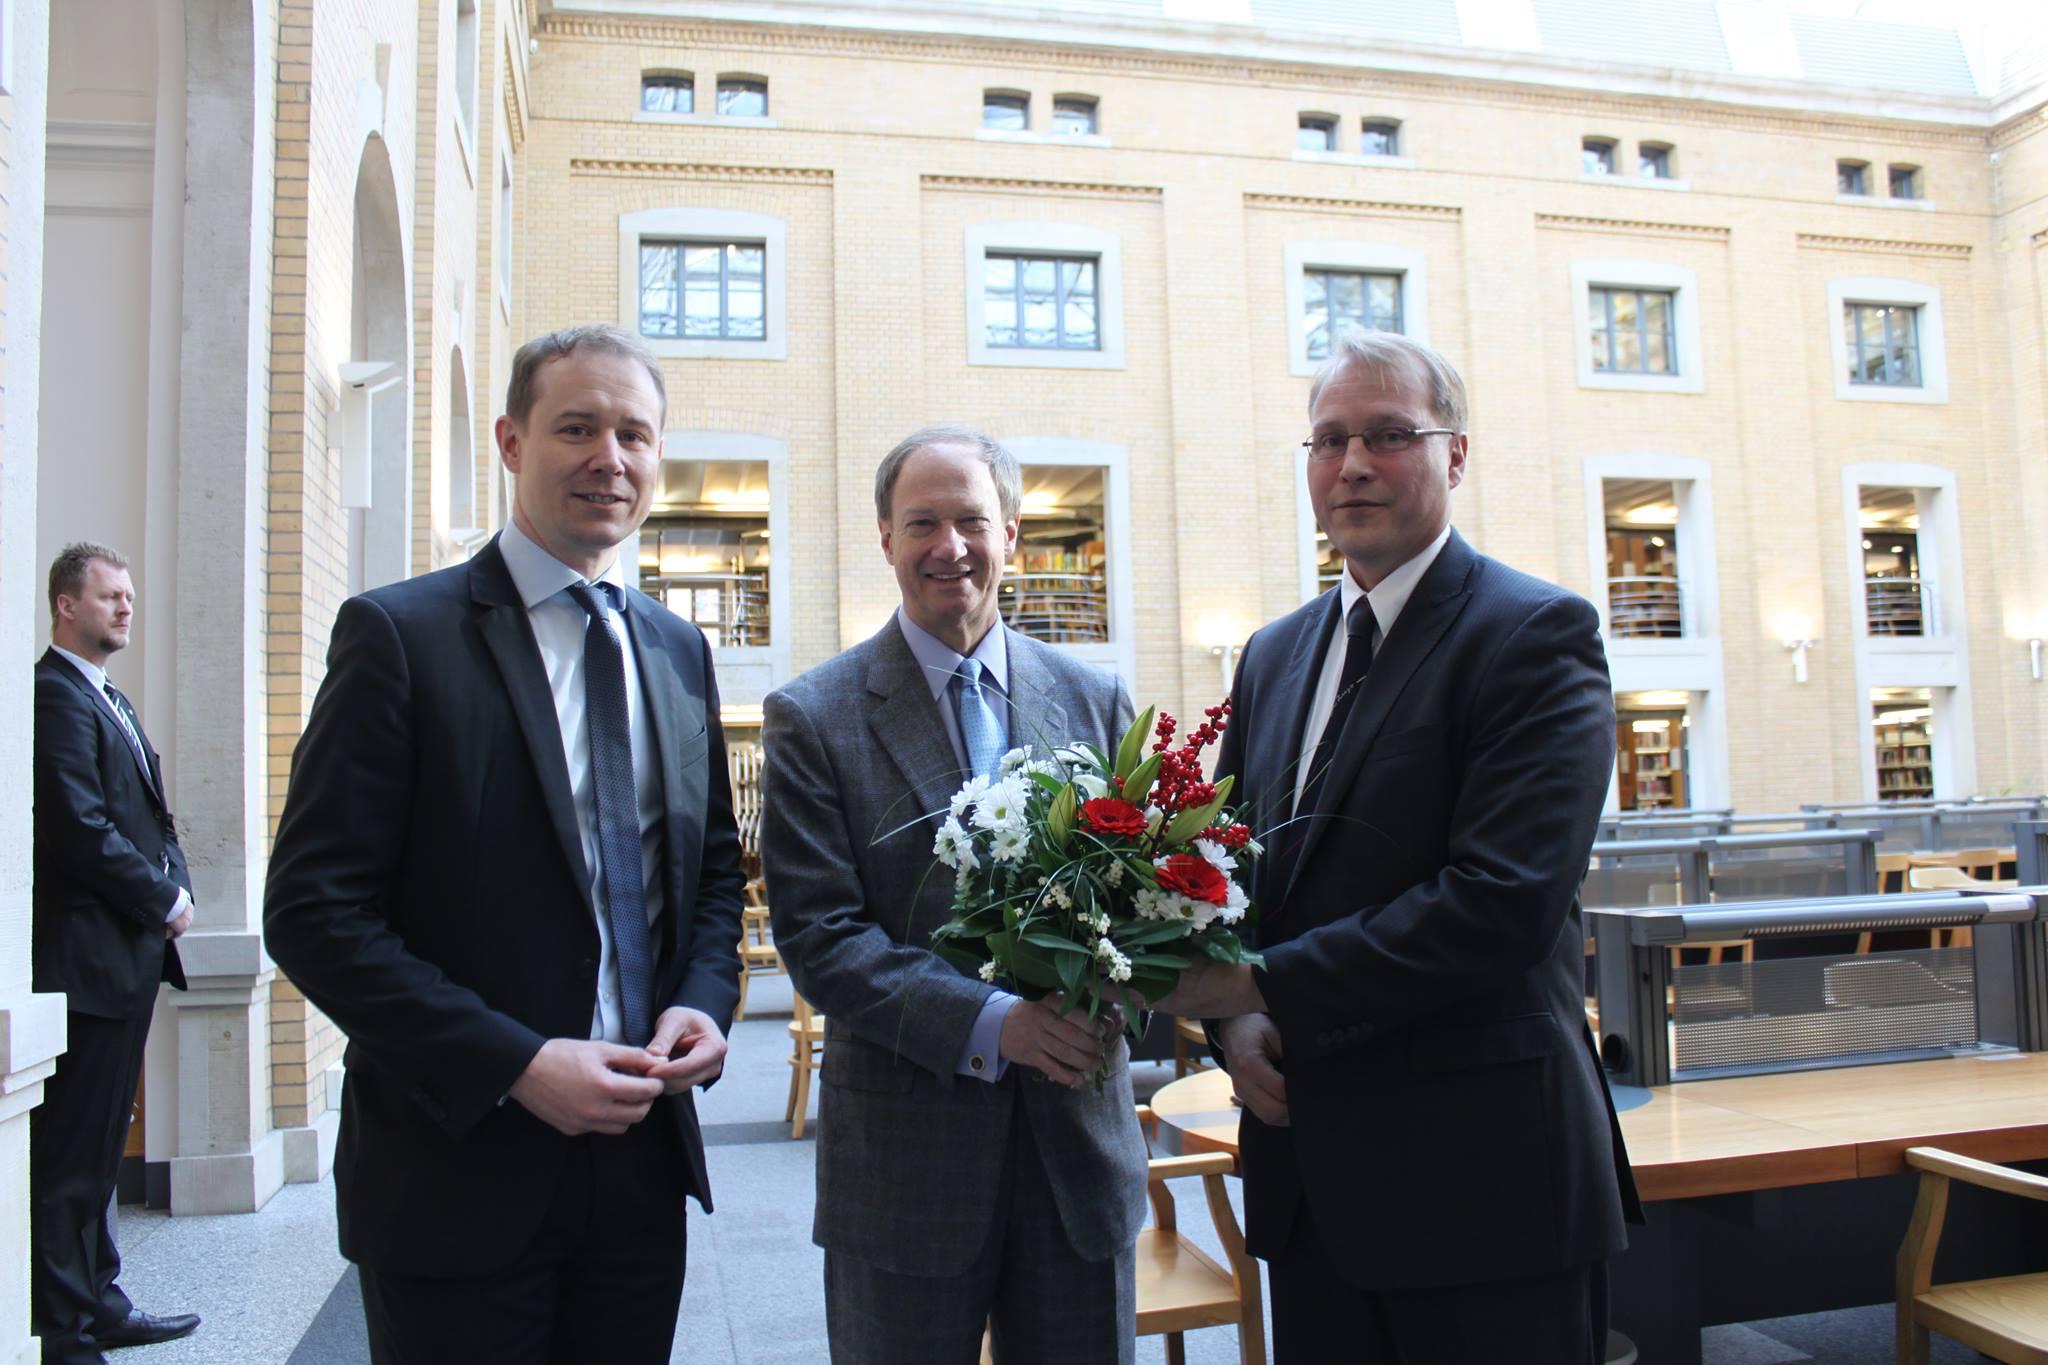 Von links: Steve Riedel, Vice President der German American Chamber of Commerce California; John B. Emerson, U.S. Botschafter, Prof. Dr. Crister S. Garrett, Universität Leipzig